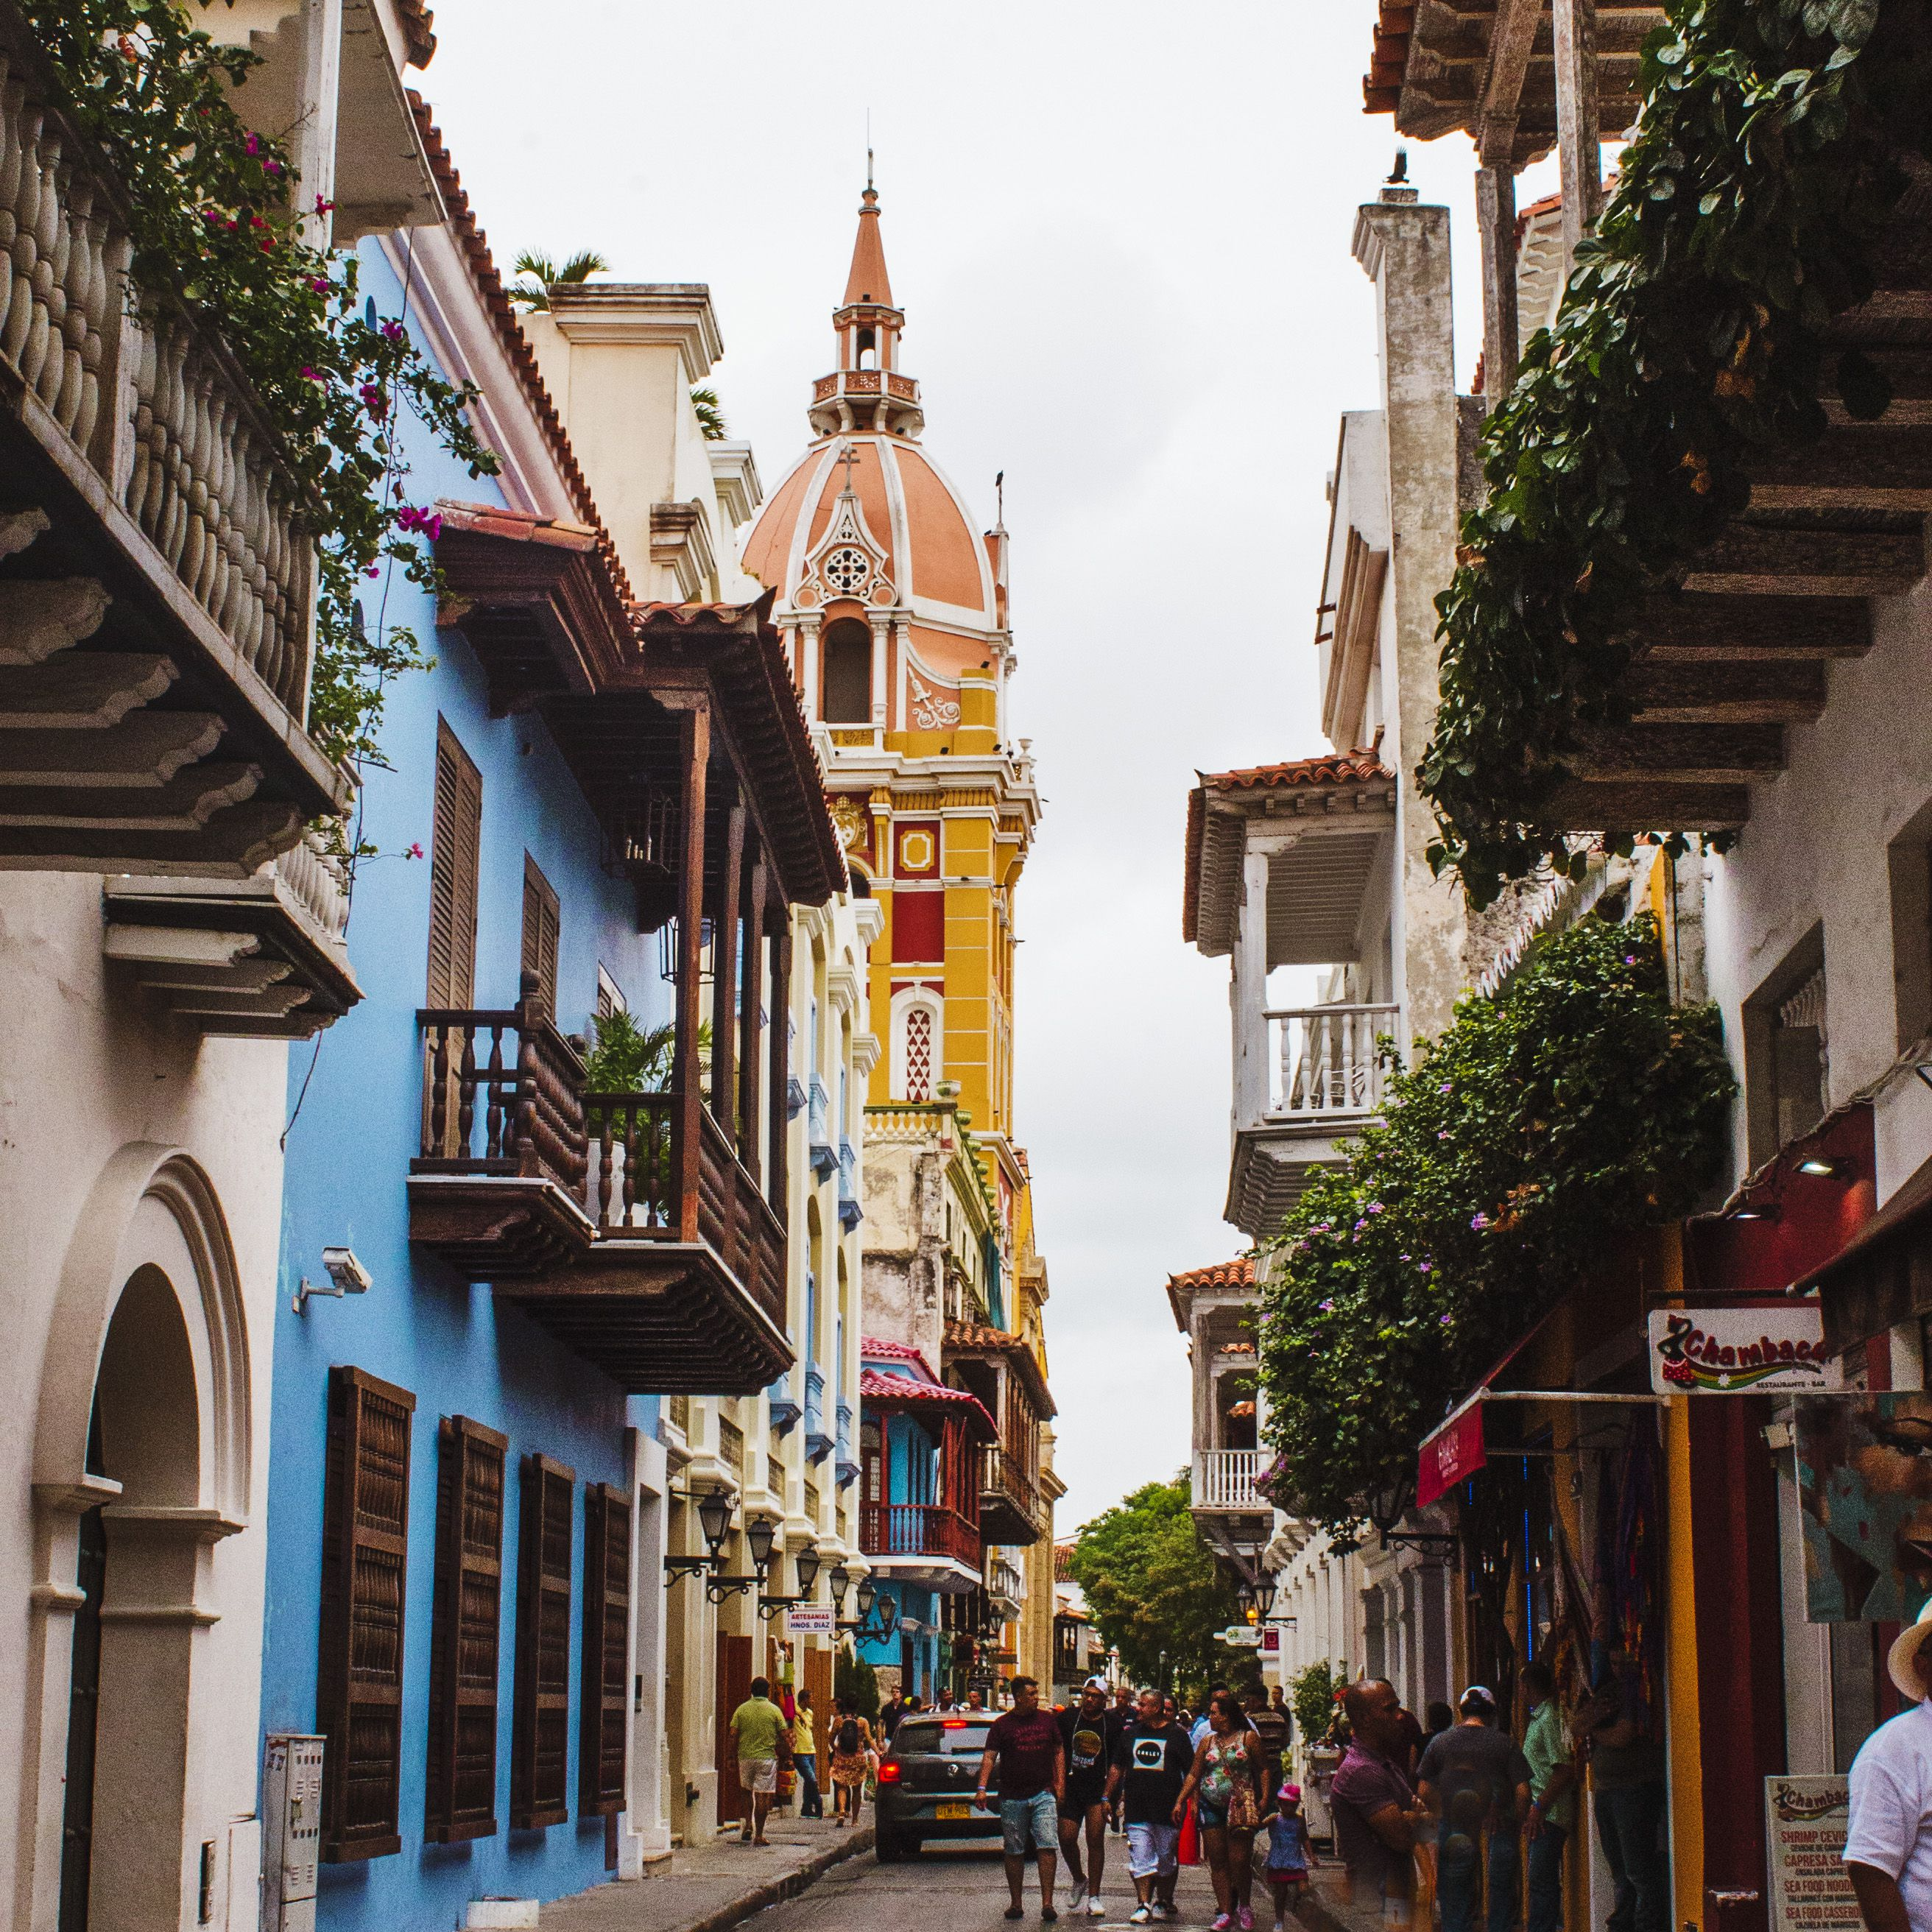 Historic center of Cartagena